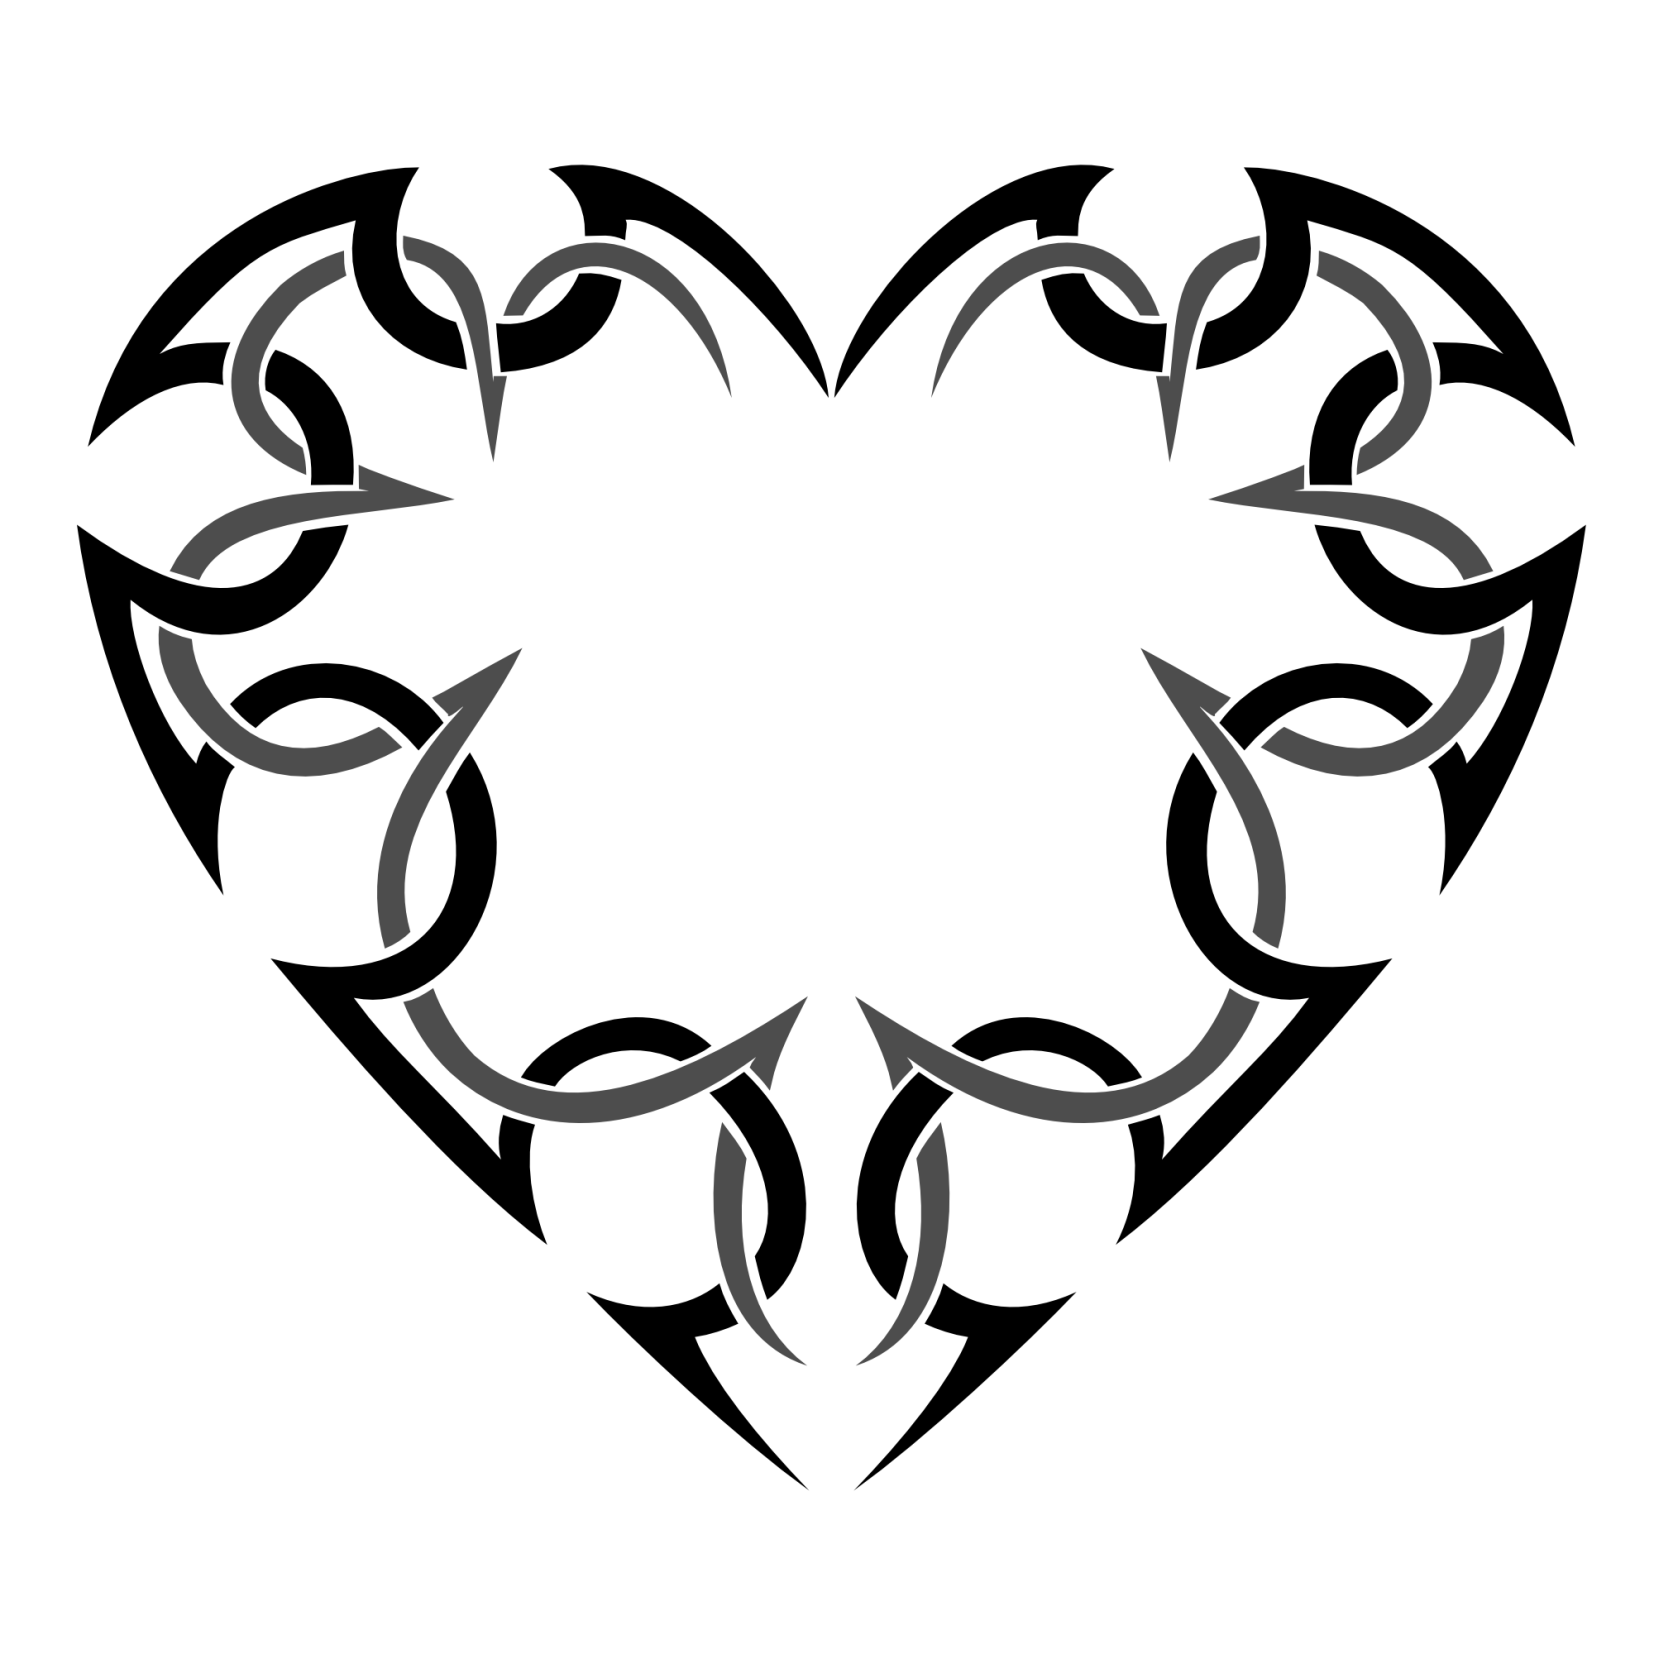 Heart tattoos designs - Tribal Heart Tattoos Designs And Ideas Clipart Best